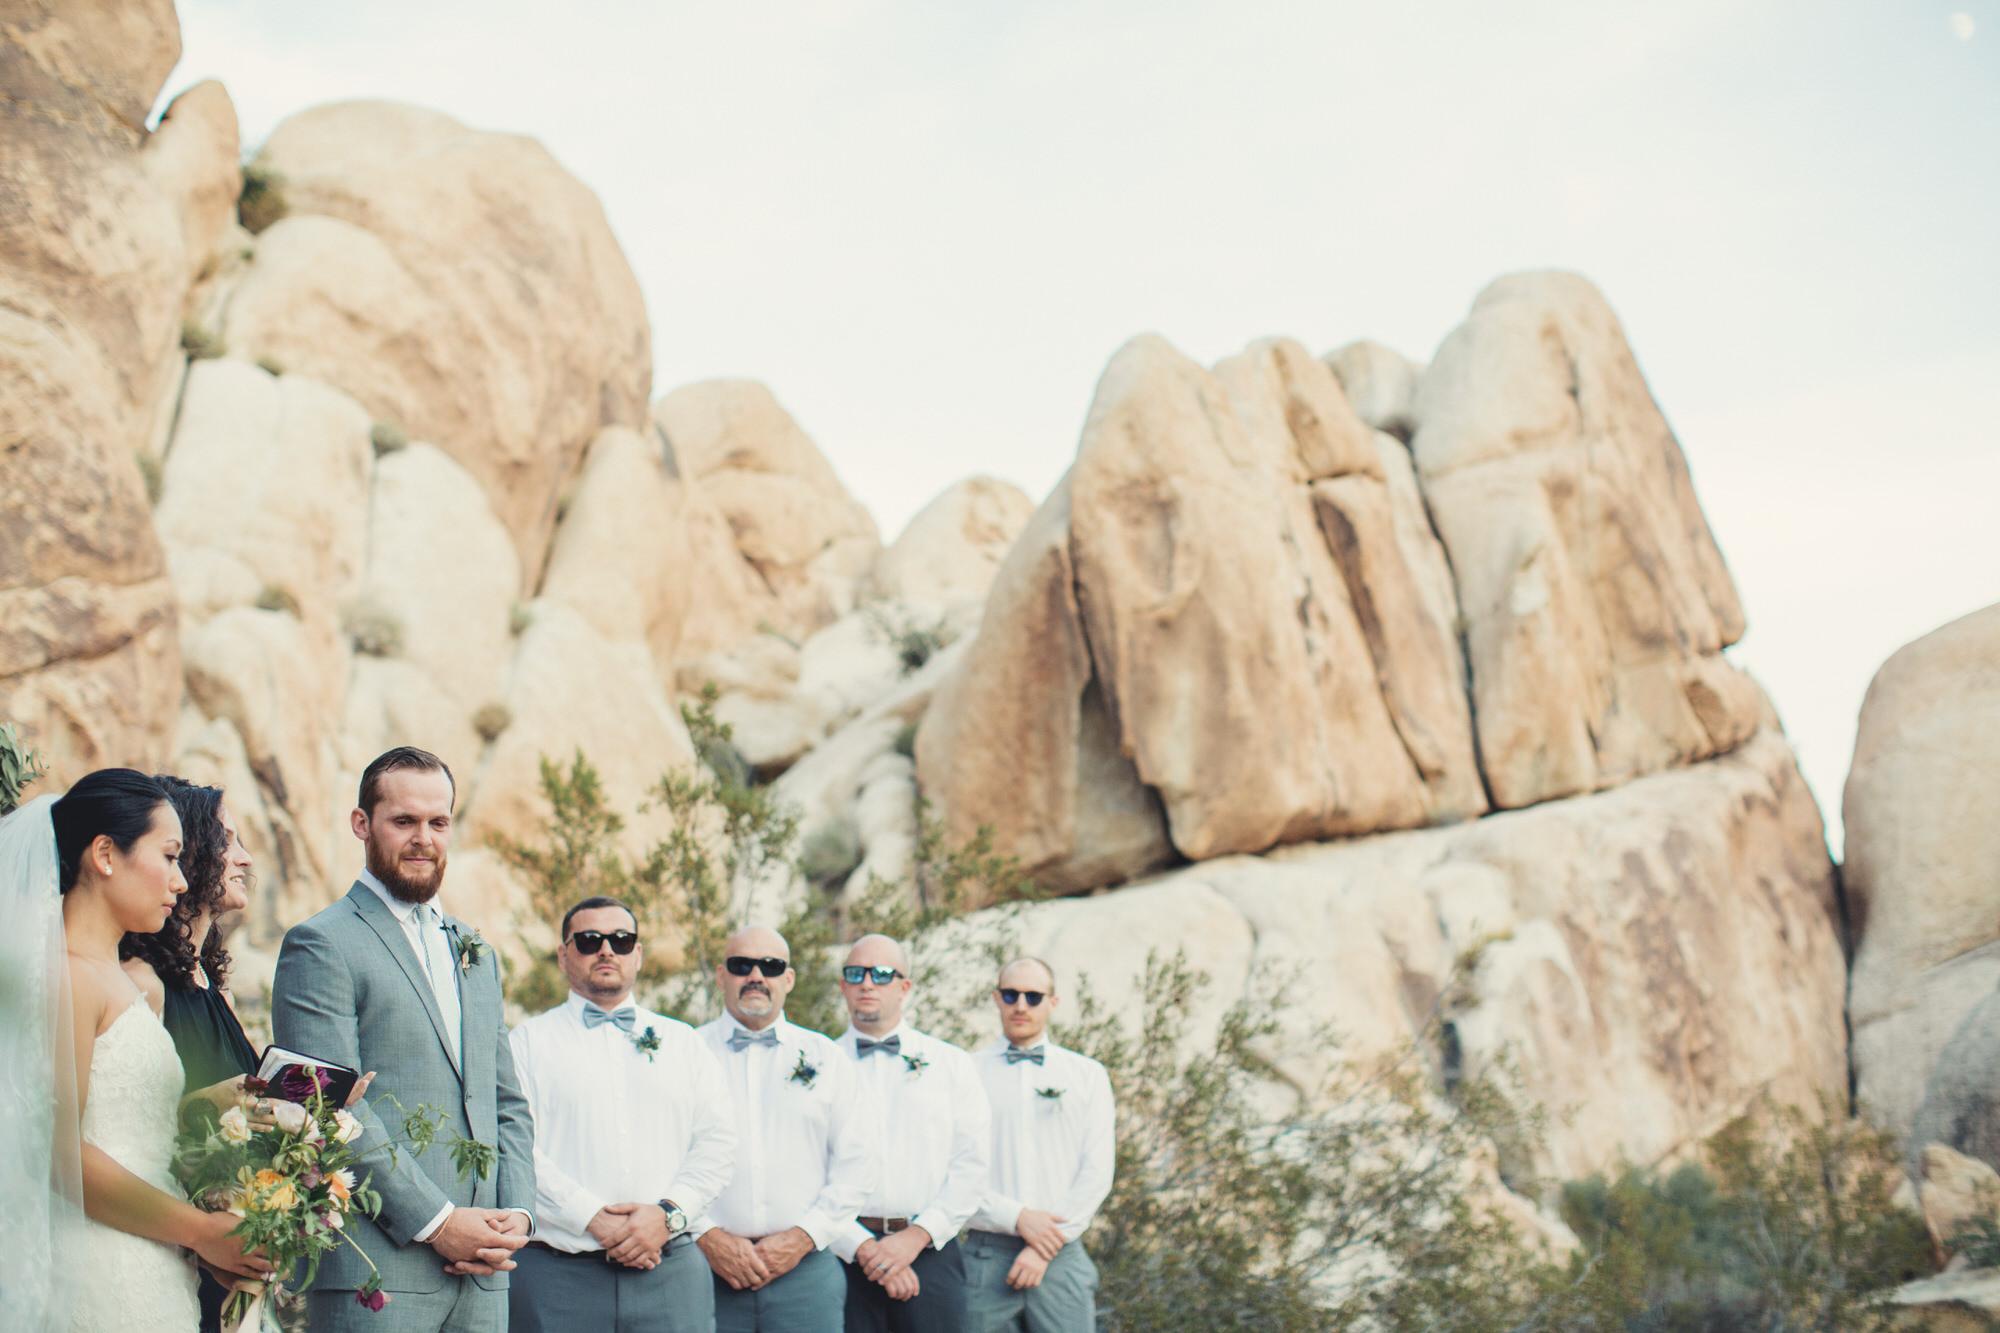 wedding in the desert